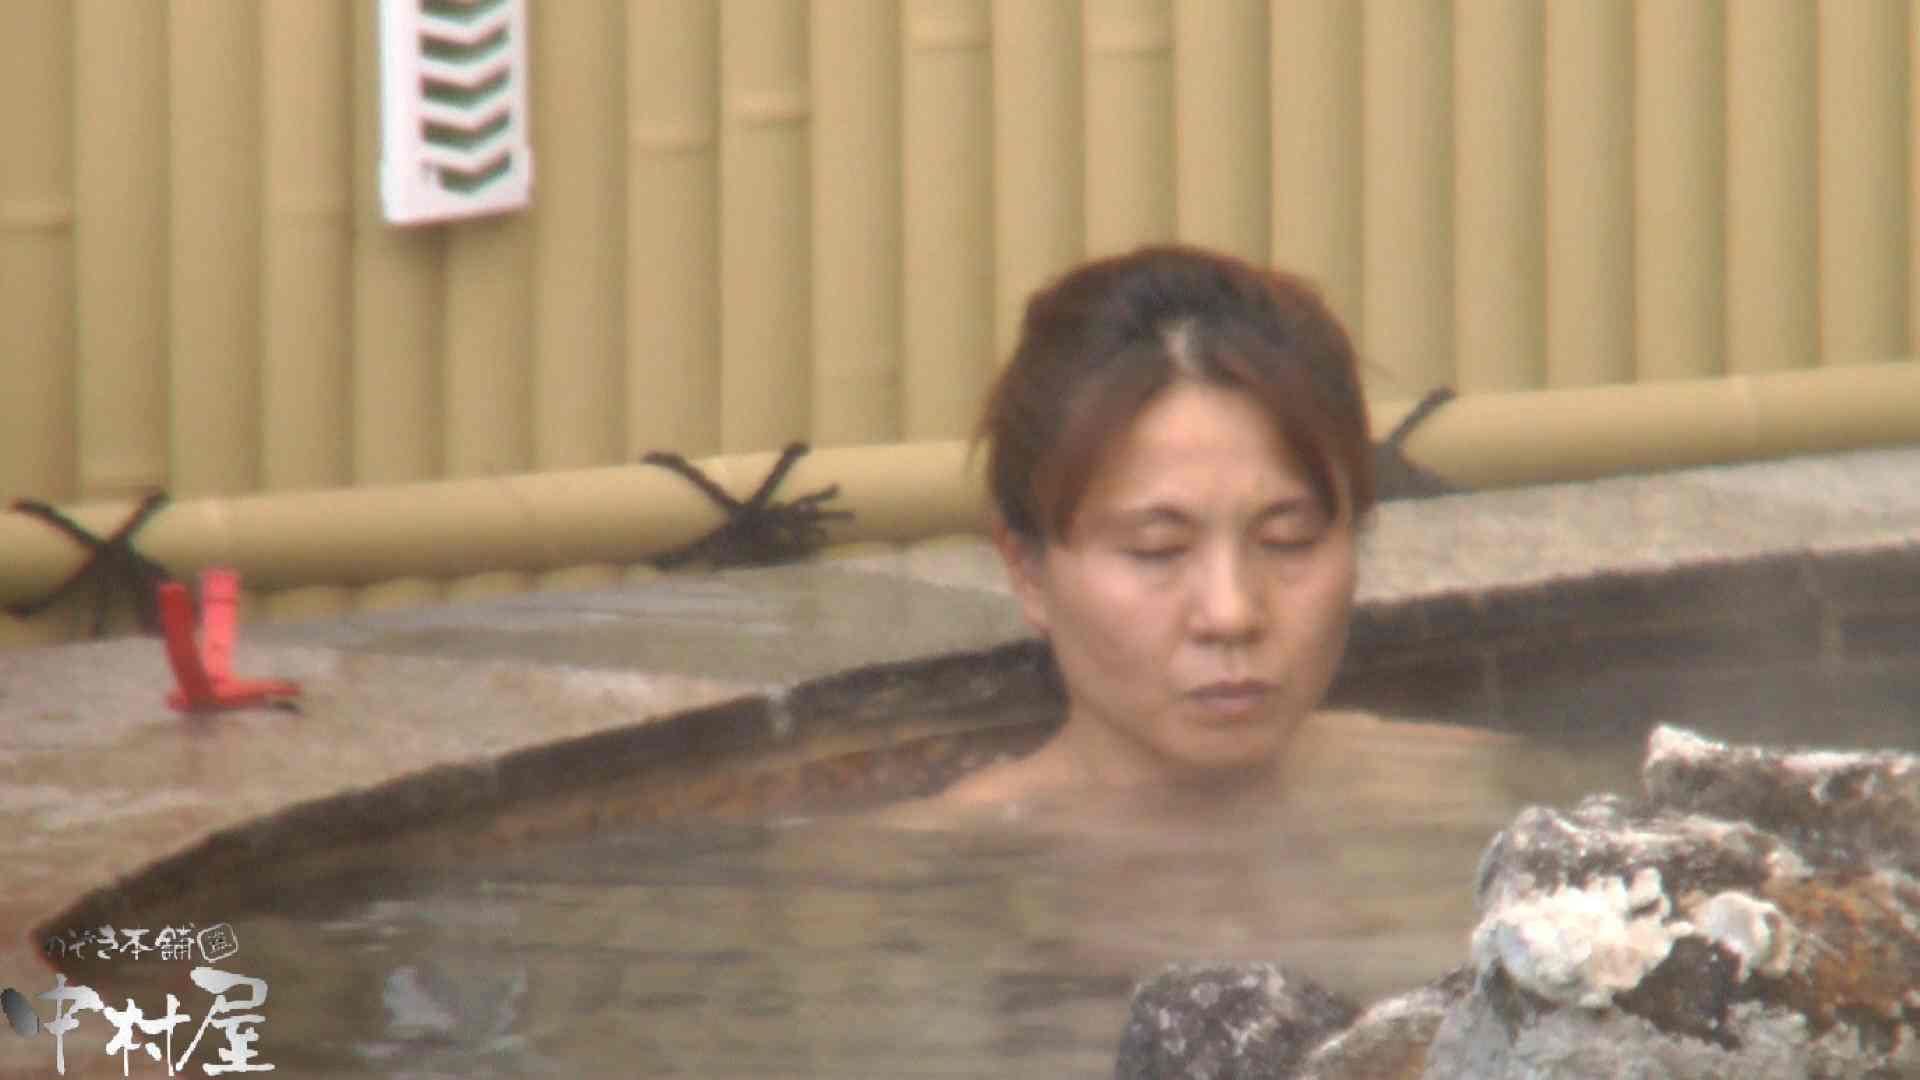 Aquaな露天風呂Vol.915 盗撮  99連発 99